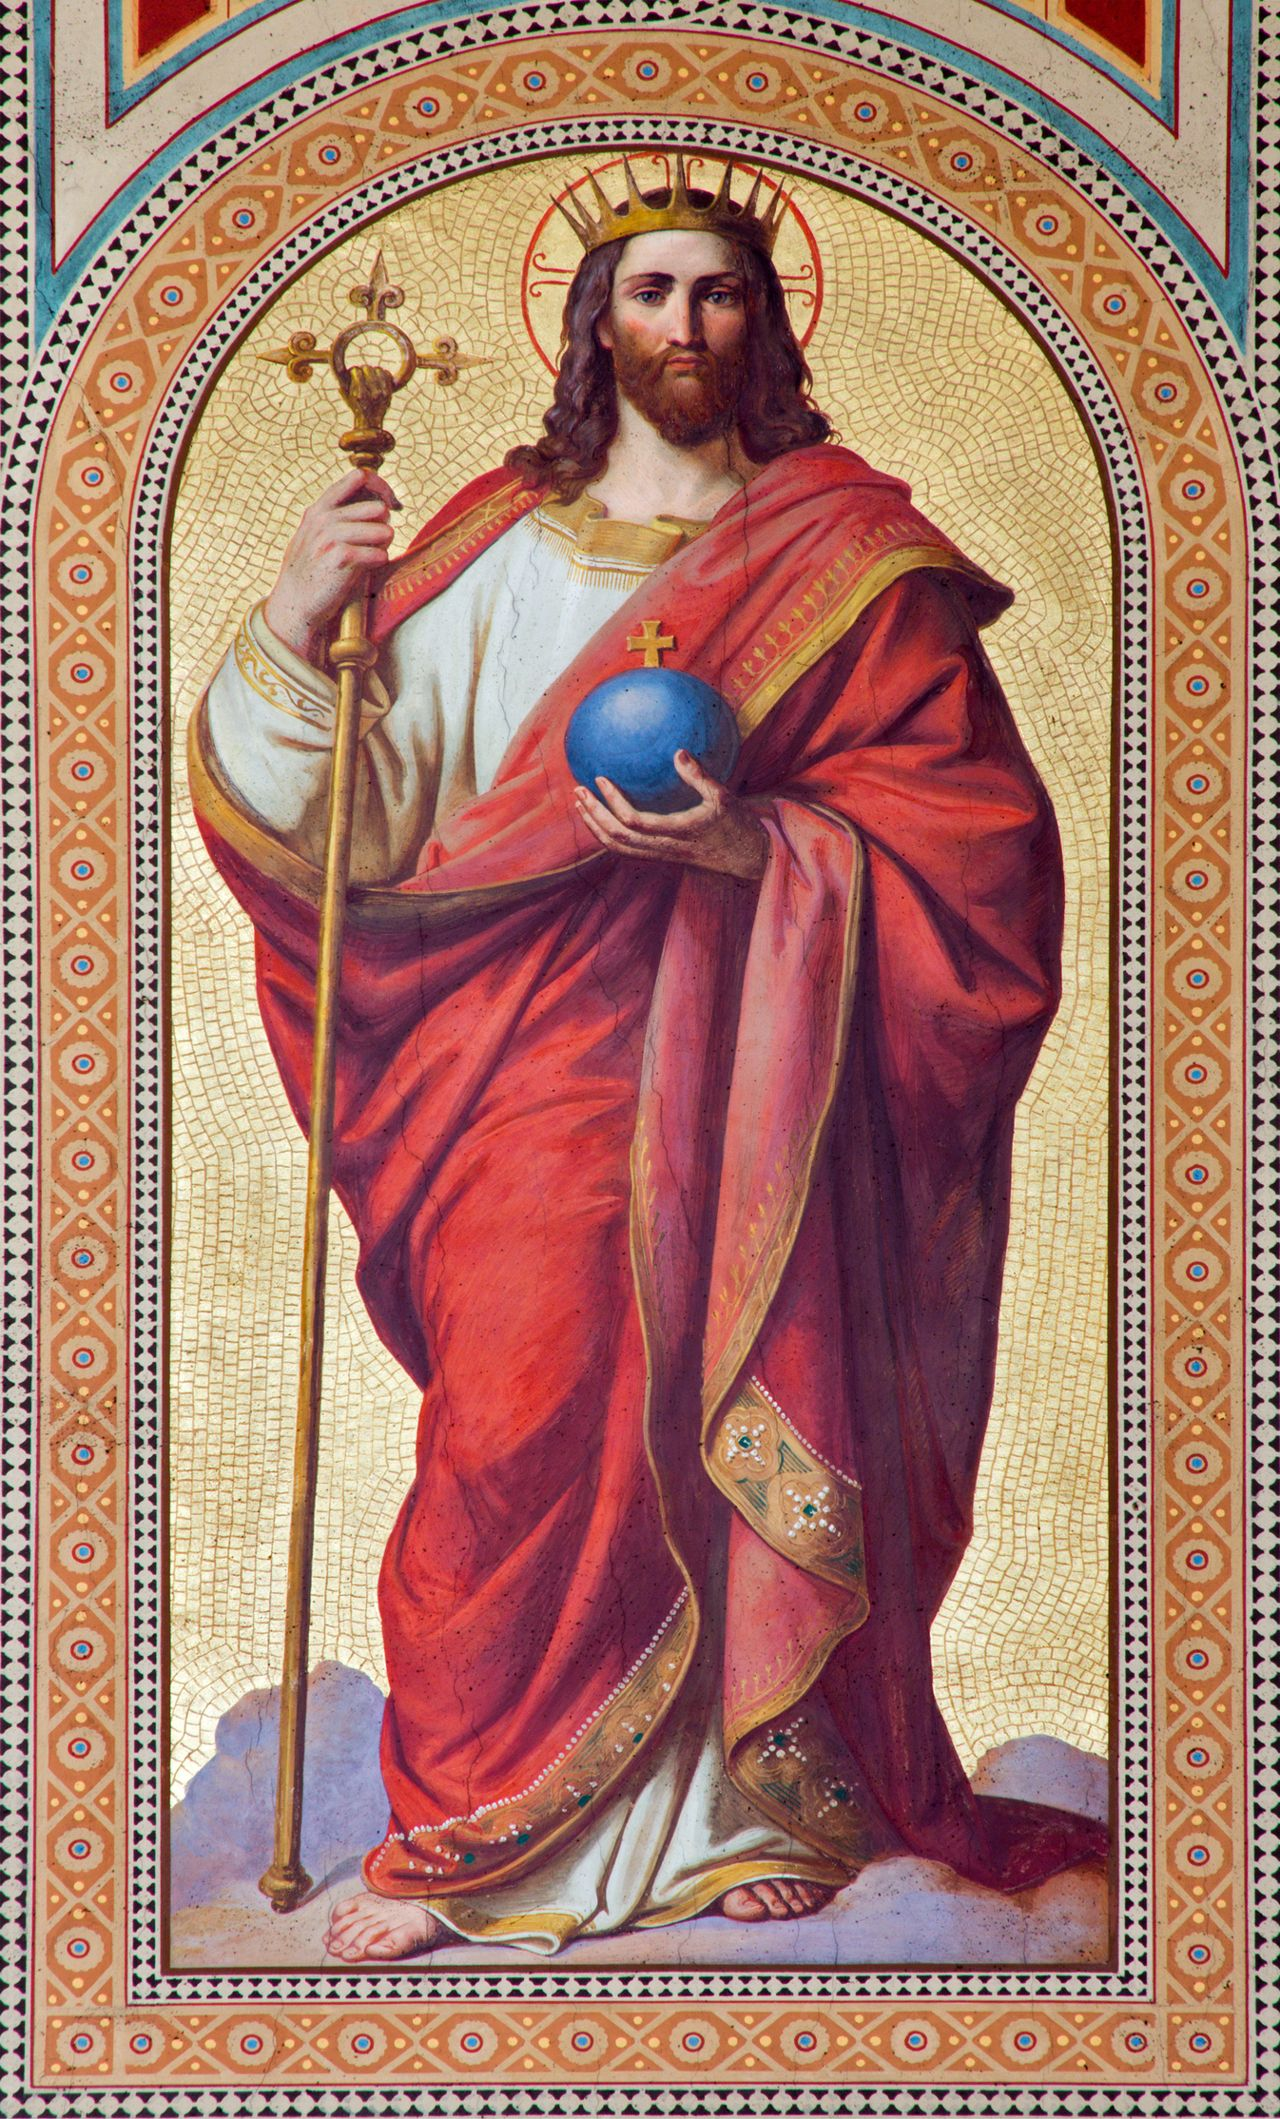 Jesus image hd